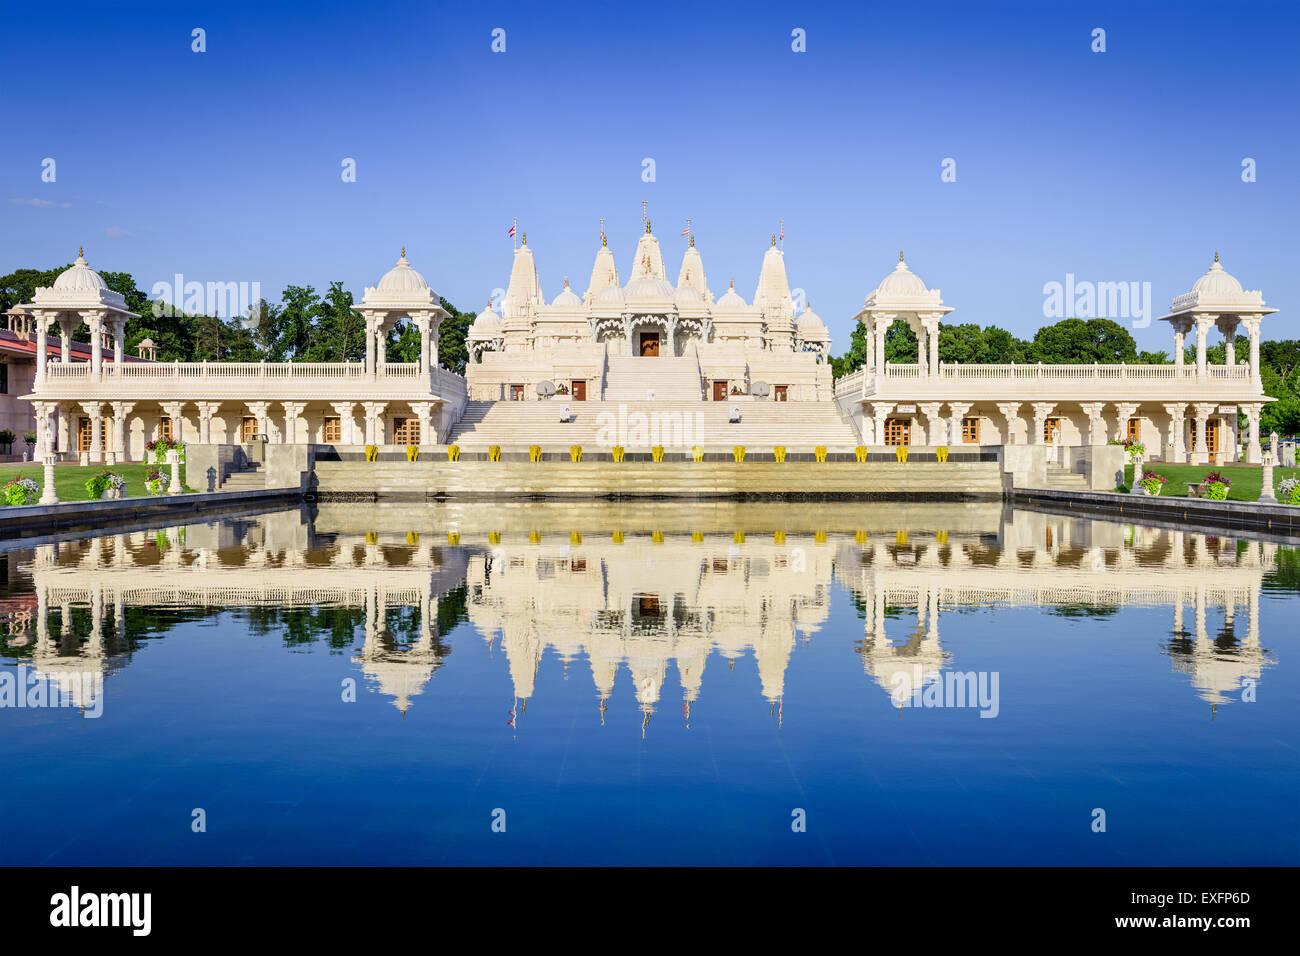 Hindu-Tempel in Atlanta, Georgia. Stockfoto